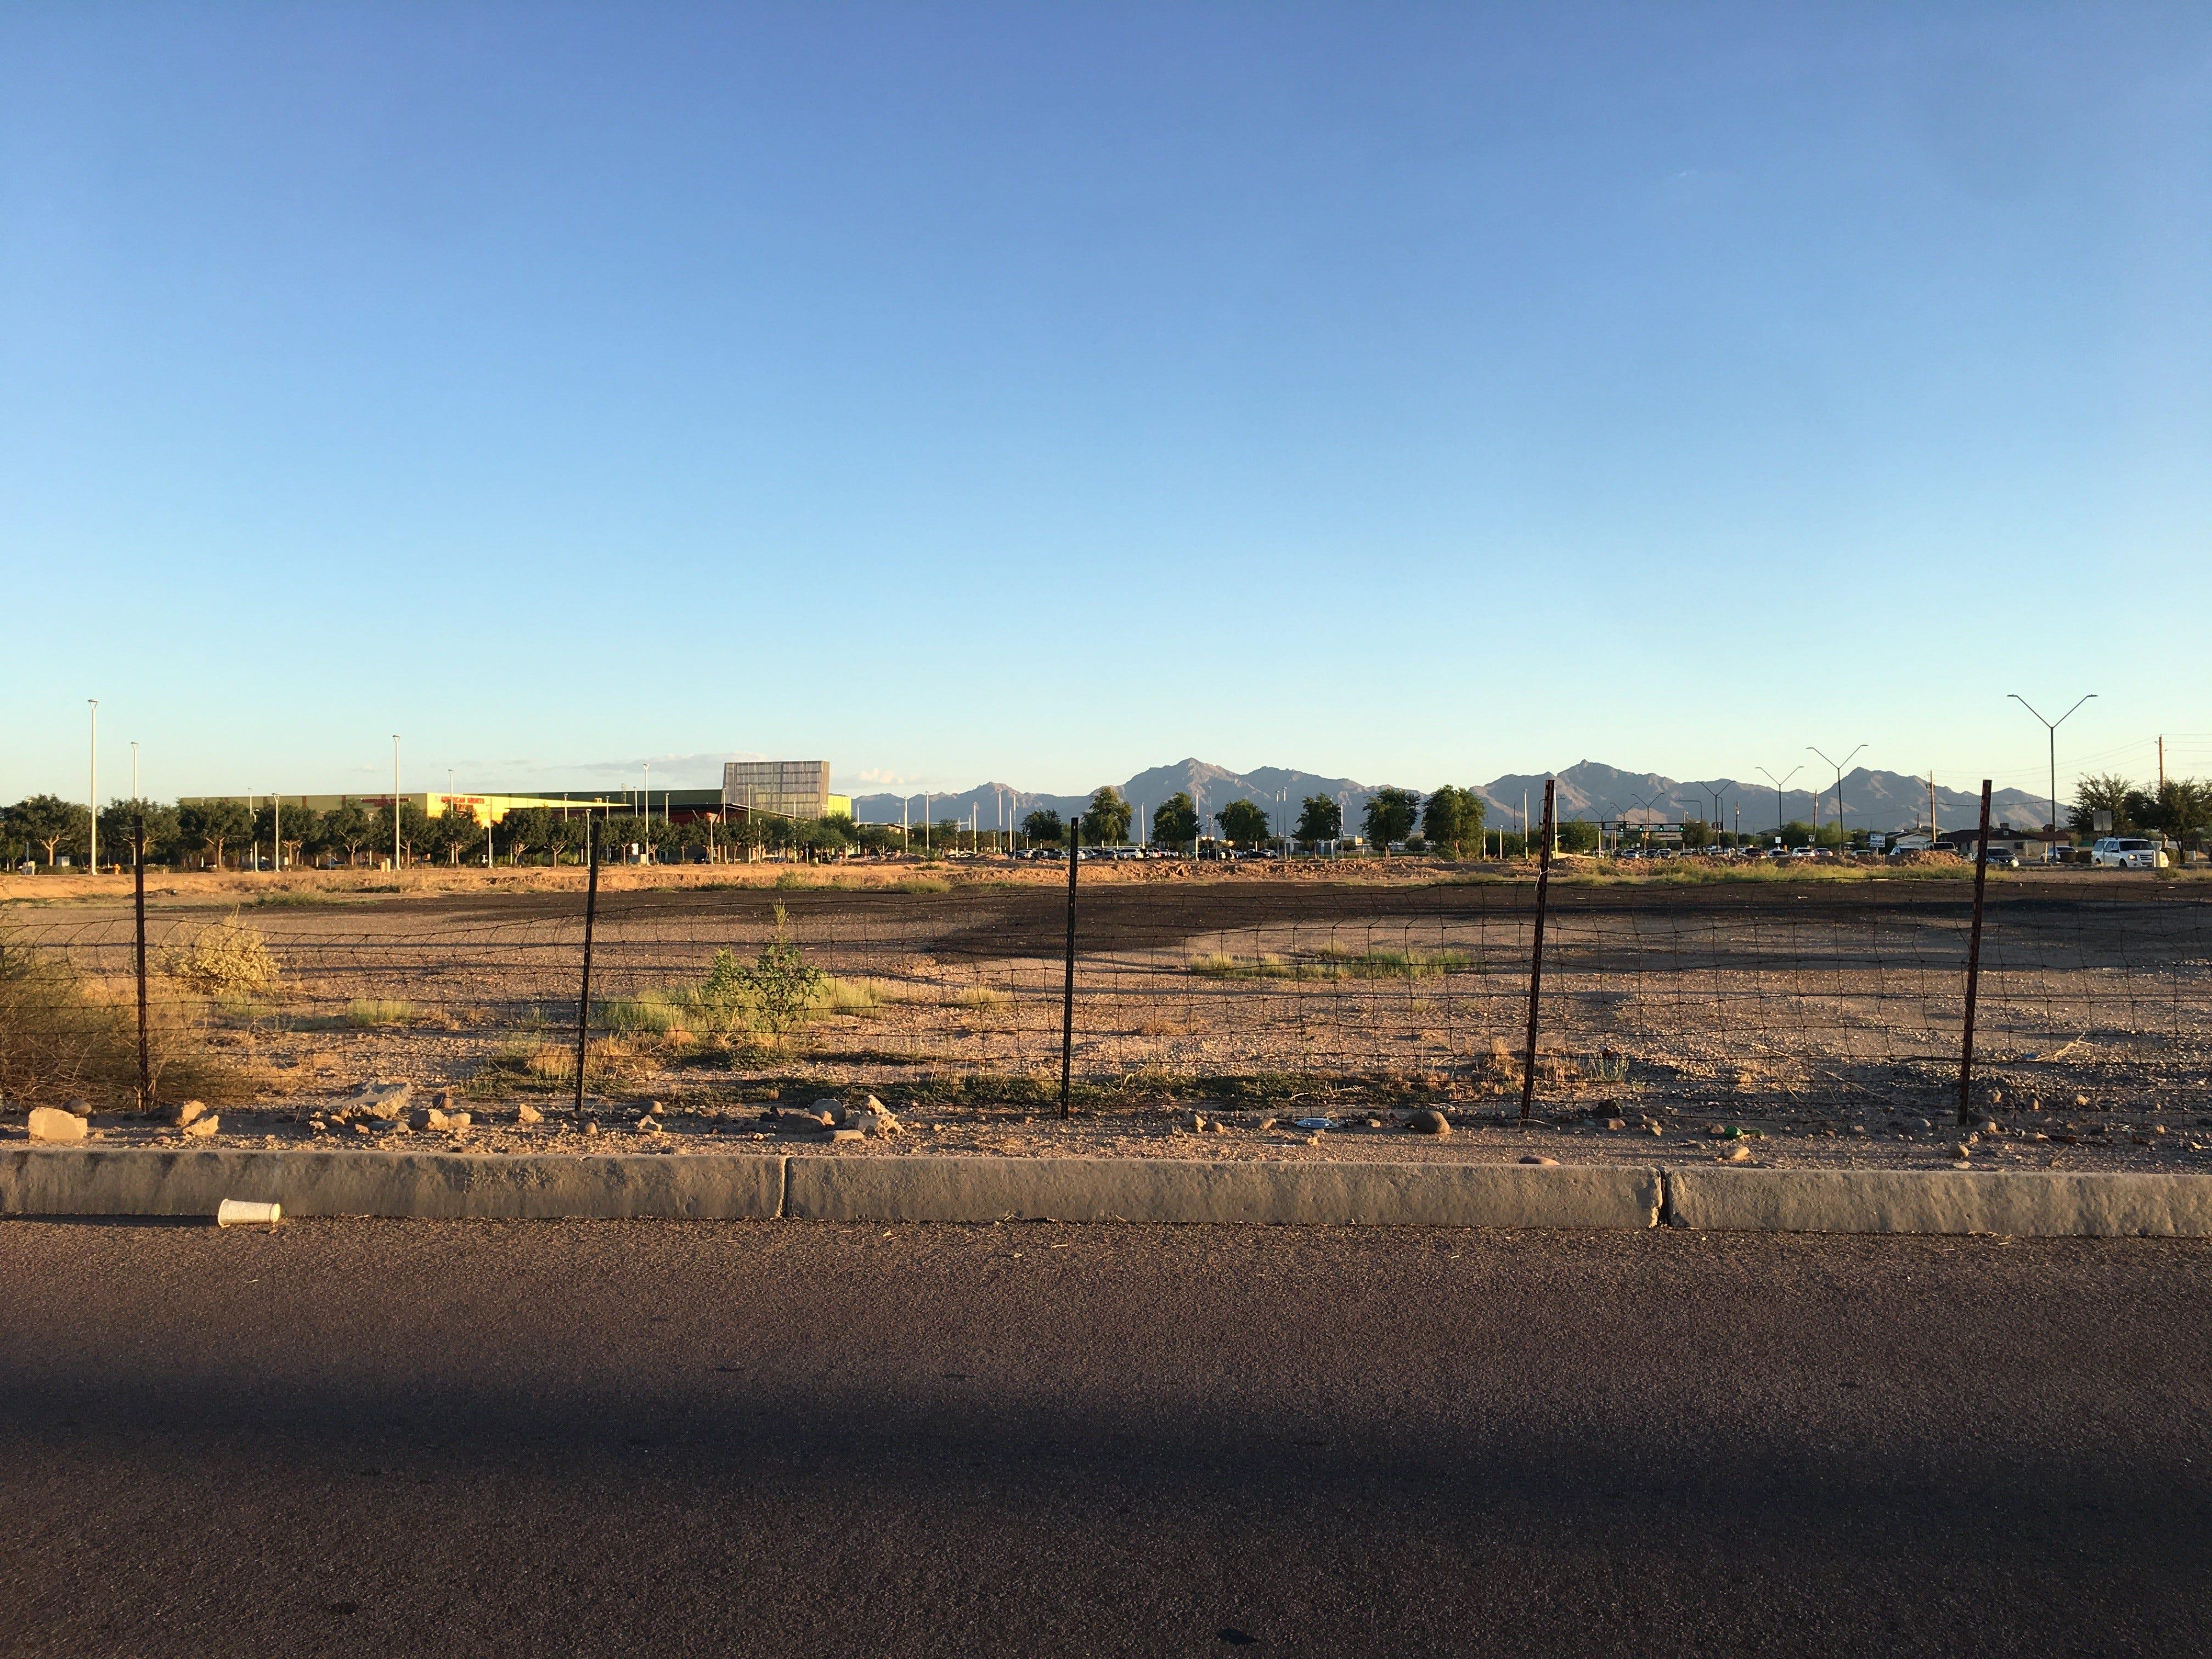 Arizona suburbs rethink boom era hopes 10 years after Great